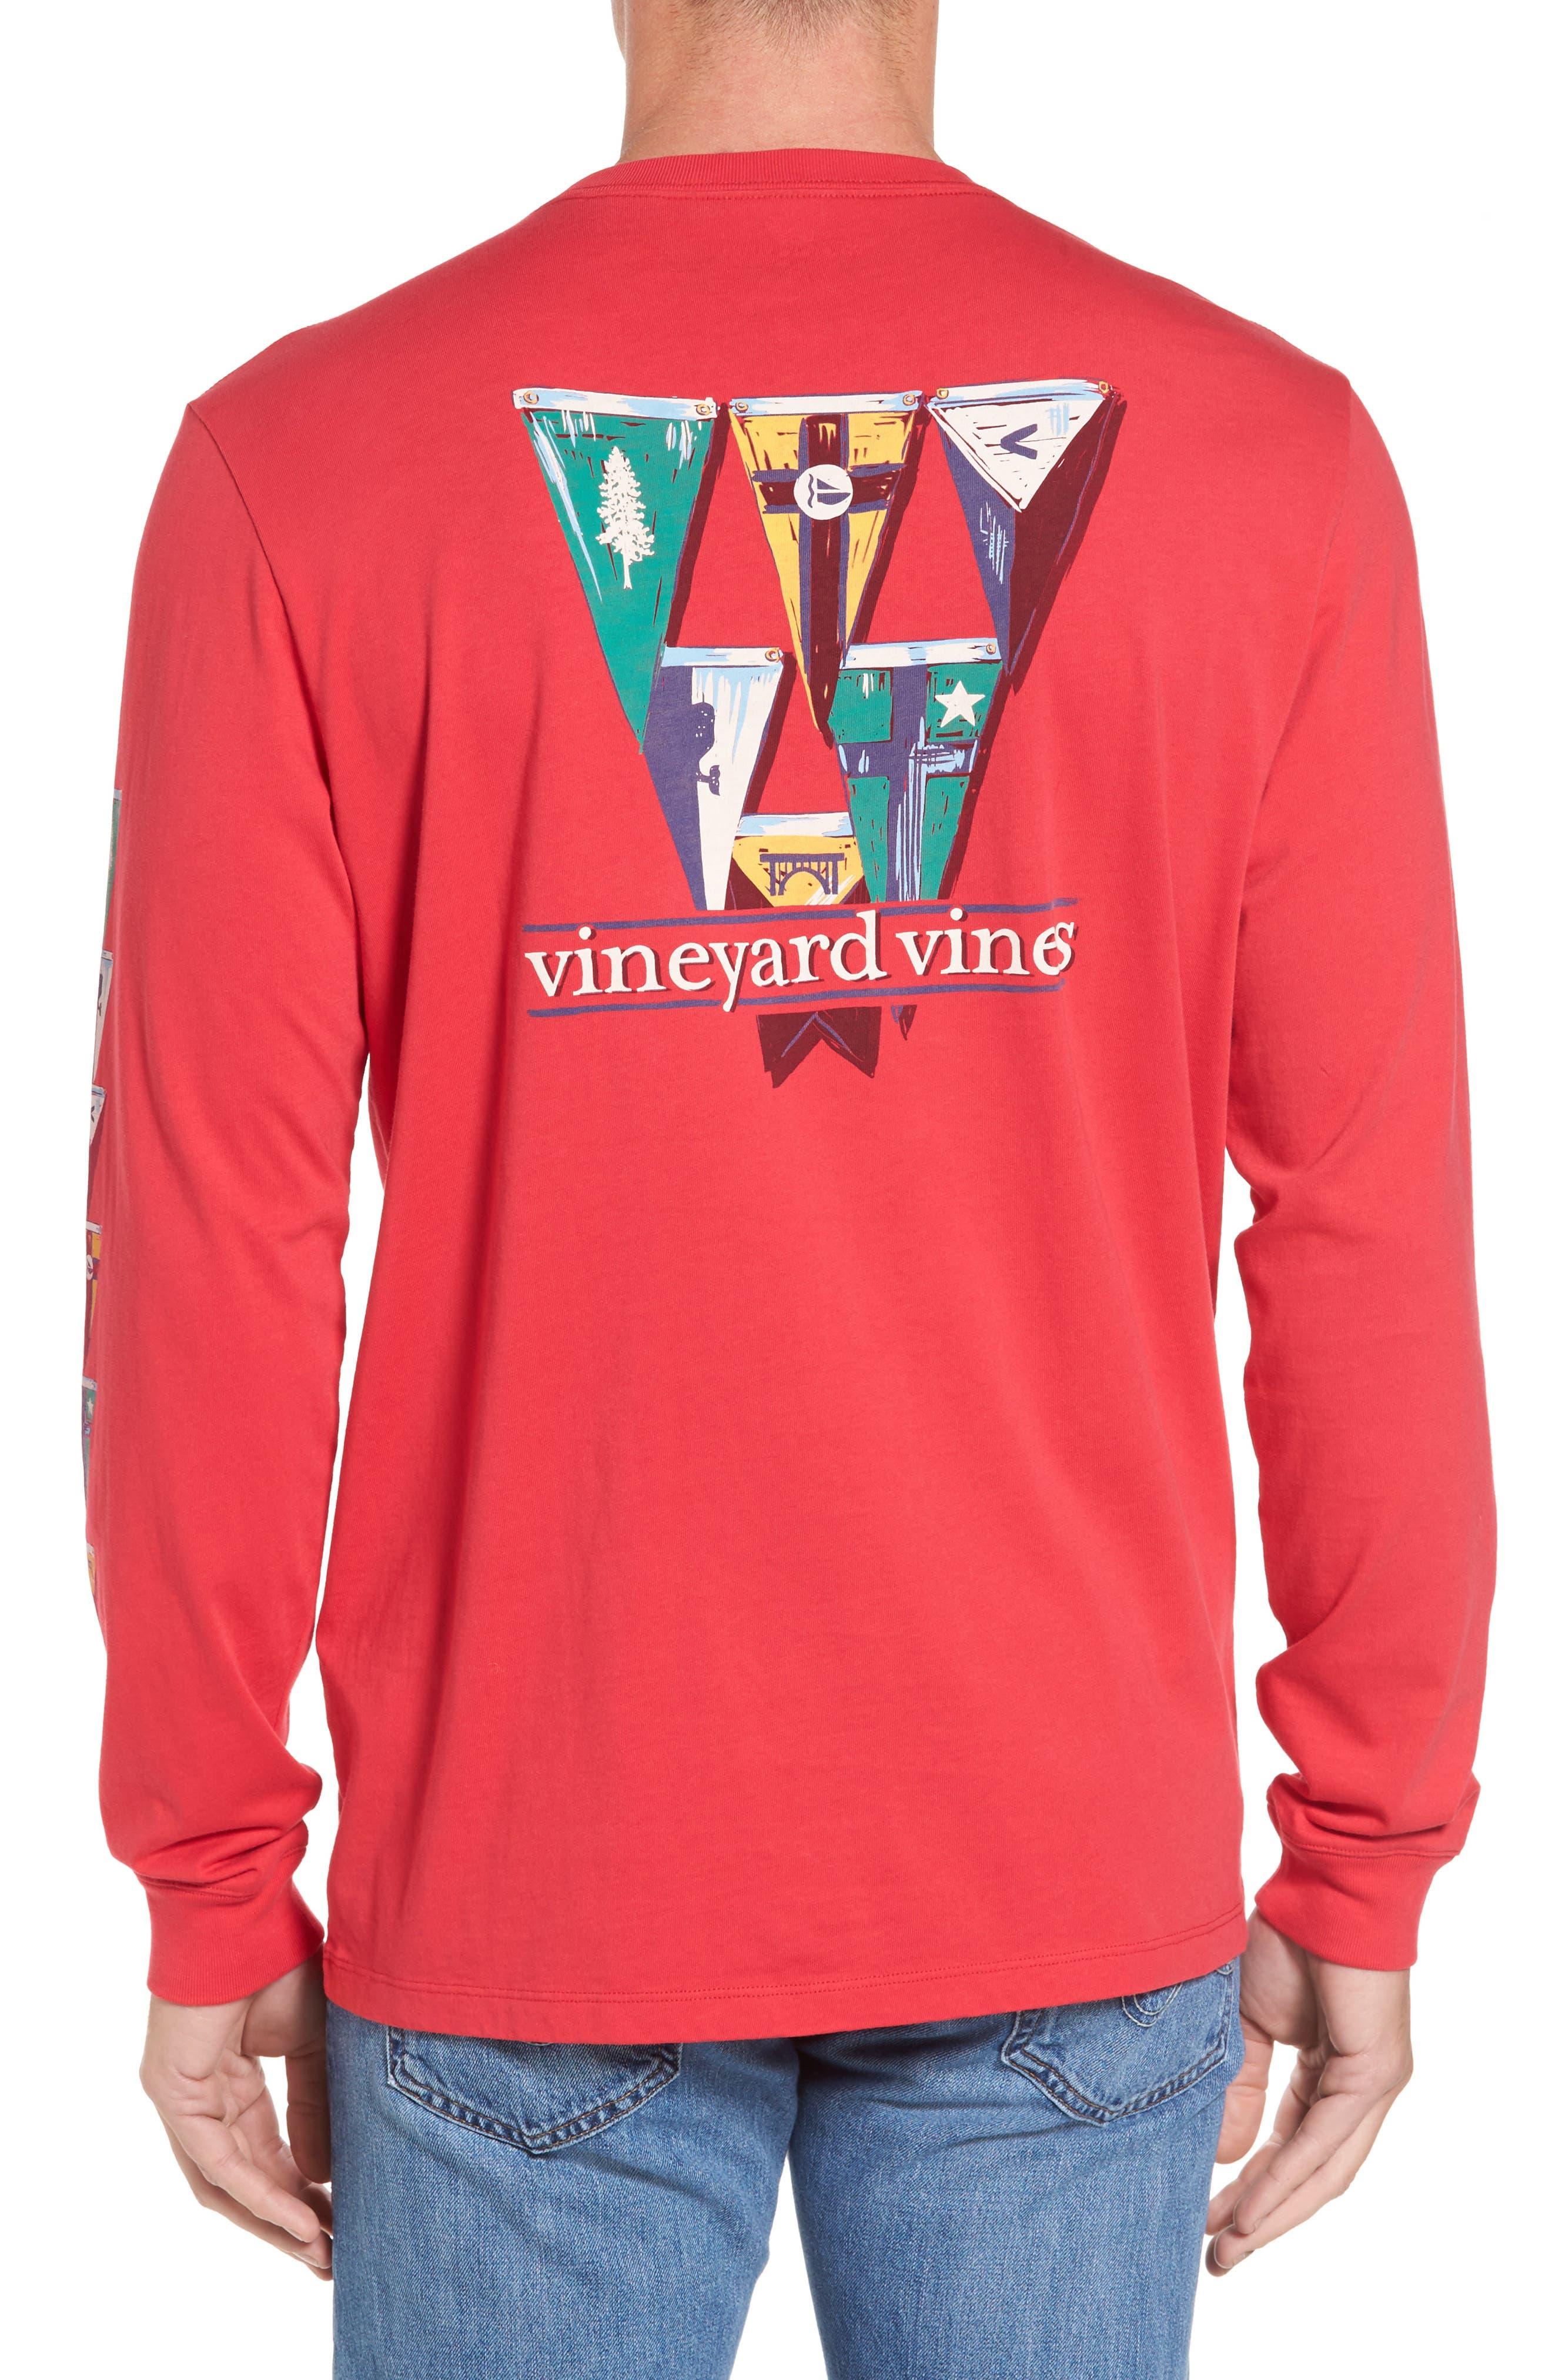 vineyard vines Coastal Burgees Long Sleeve Pocket T-Shirt